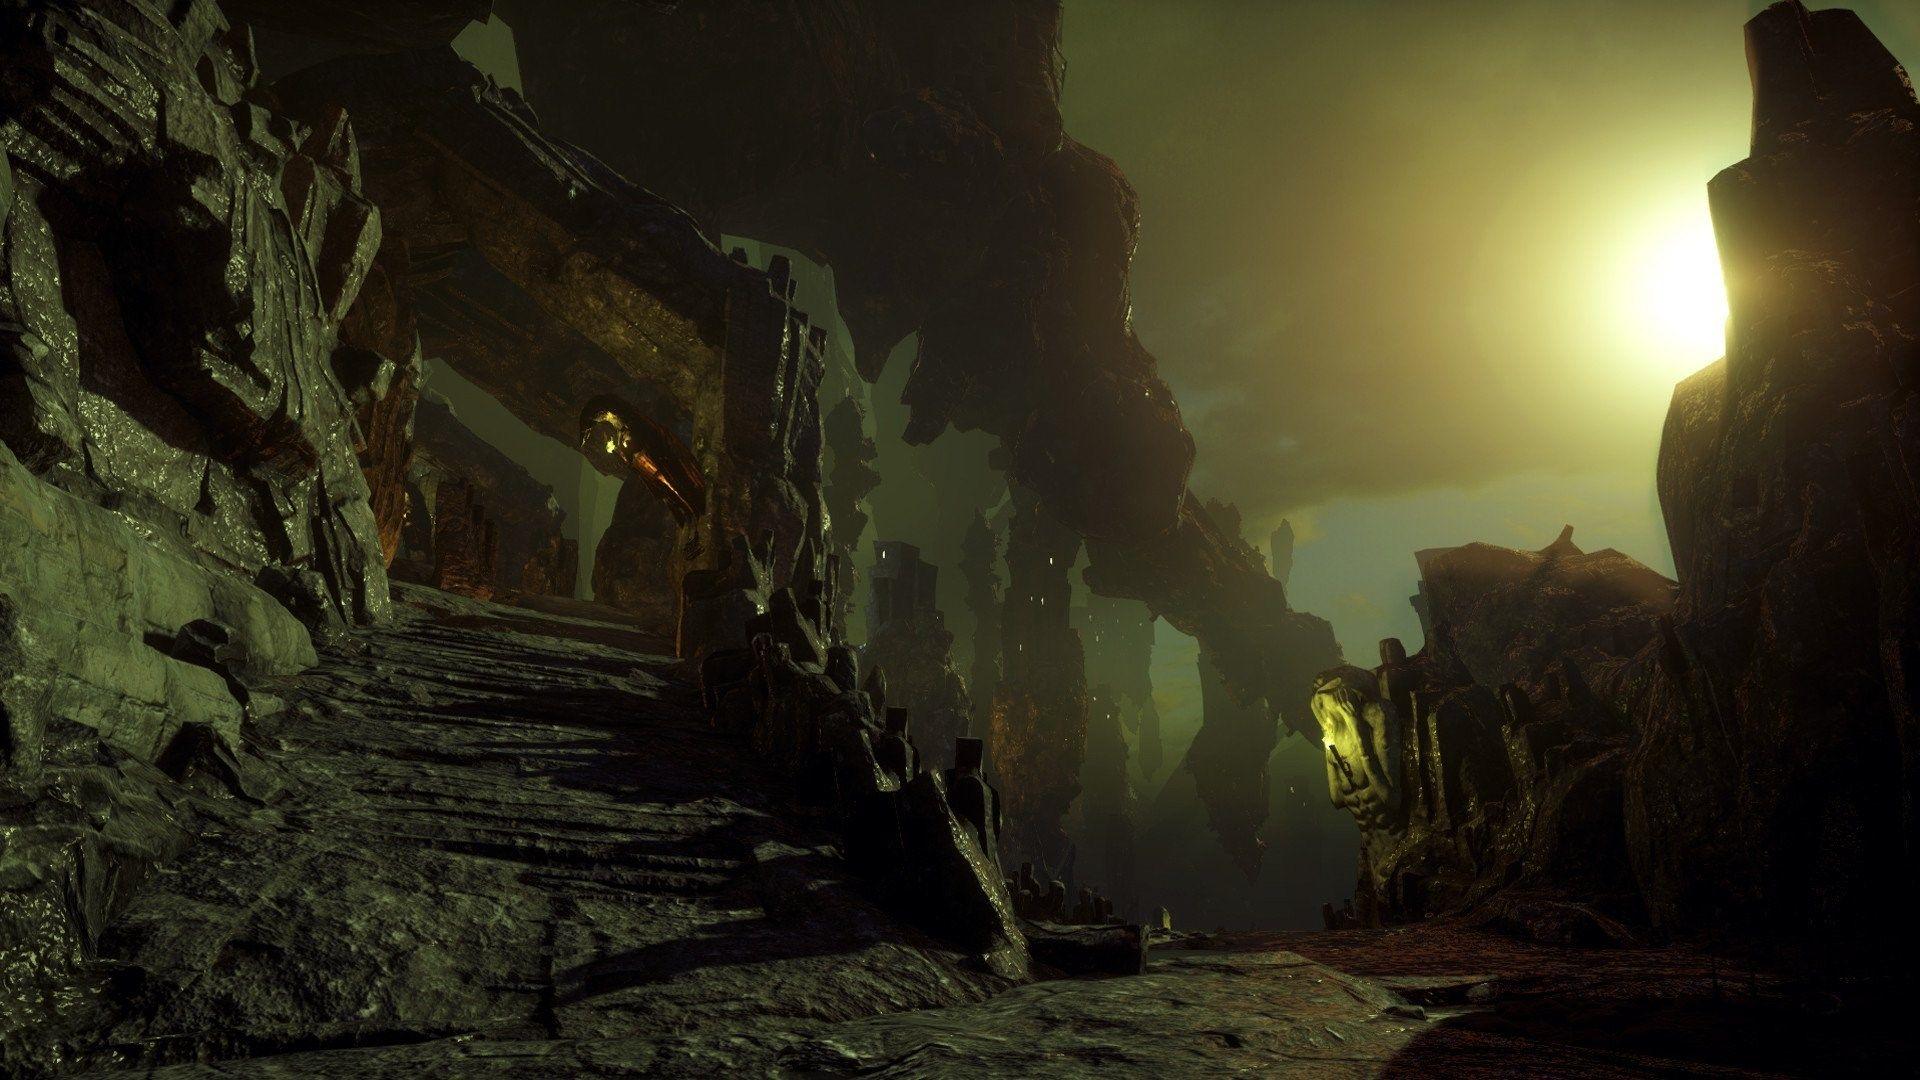 Jaz Bush Beautiful Pictures Of Dragon Age Inquisition